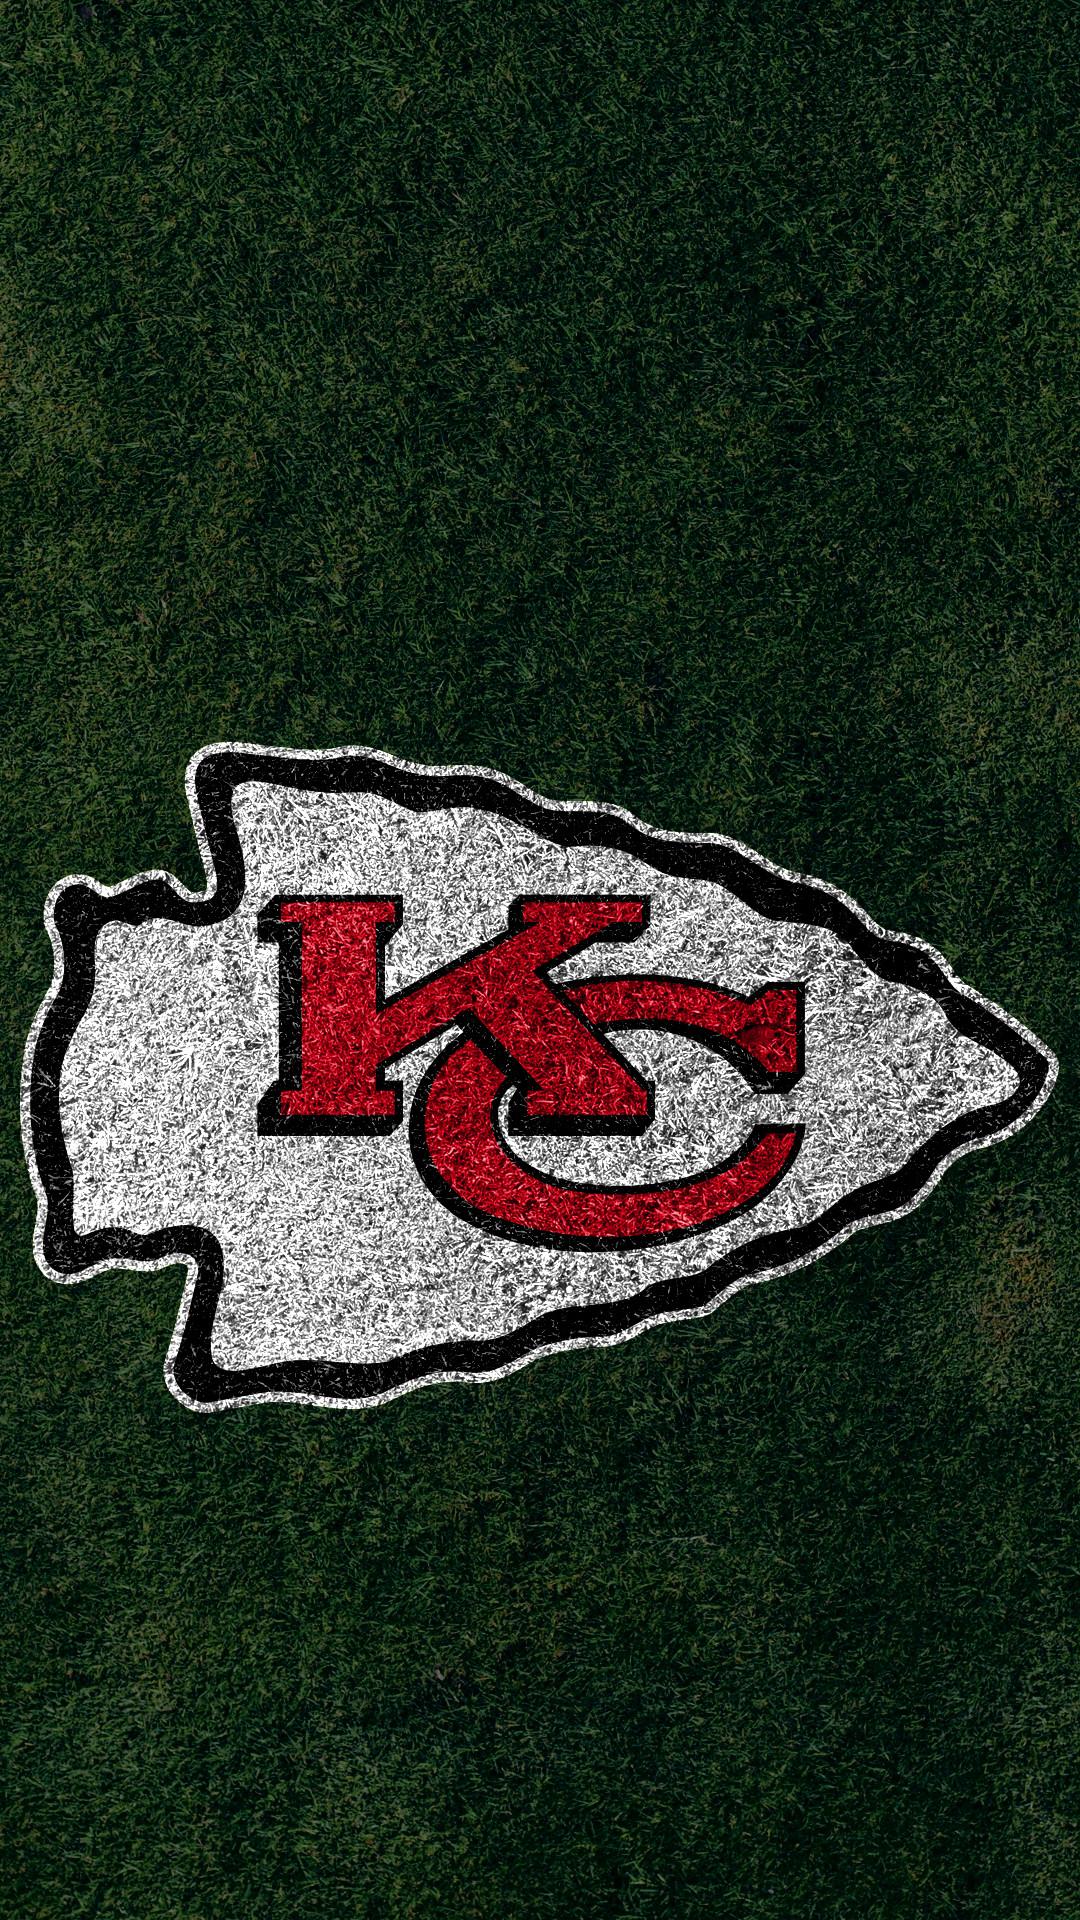 … Kansas City Chiefs 2017 turf logo wallpaper free iphone 5, 6, 7, galaxy